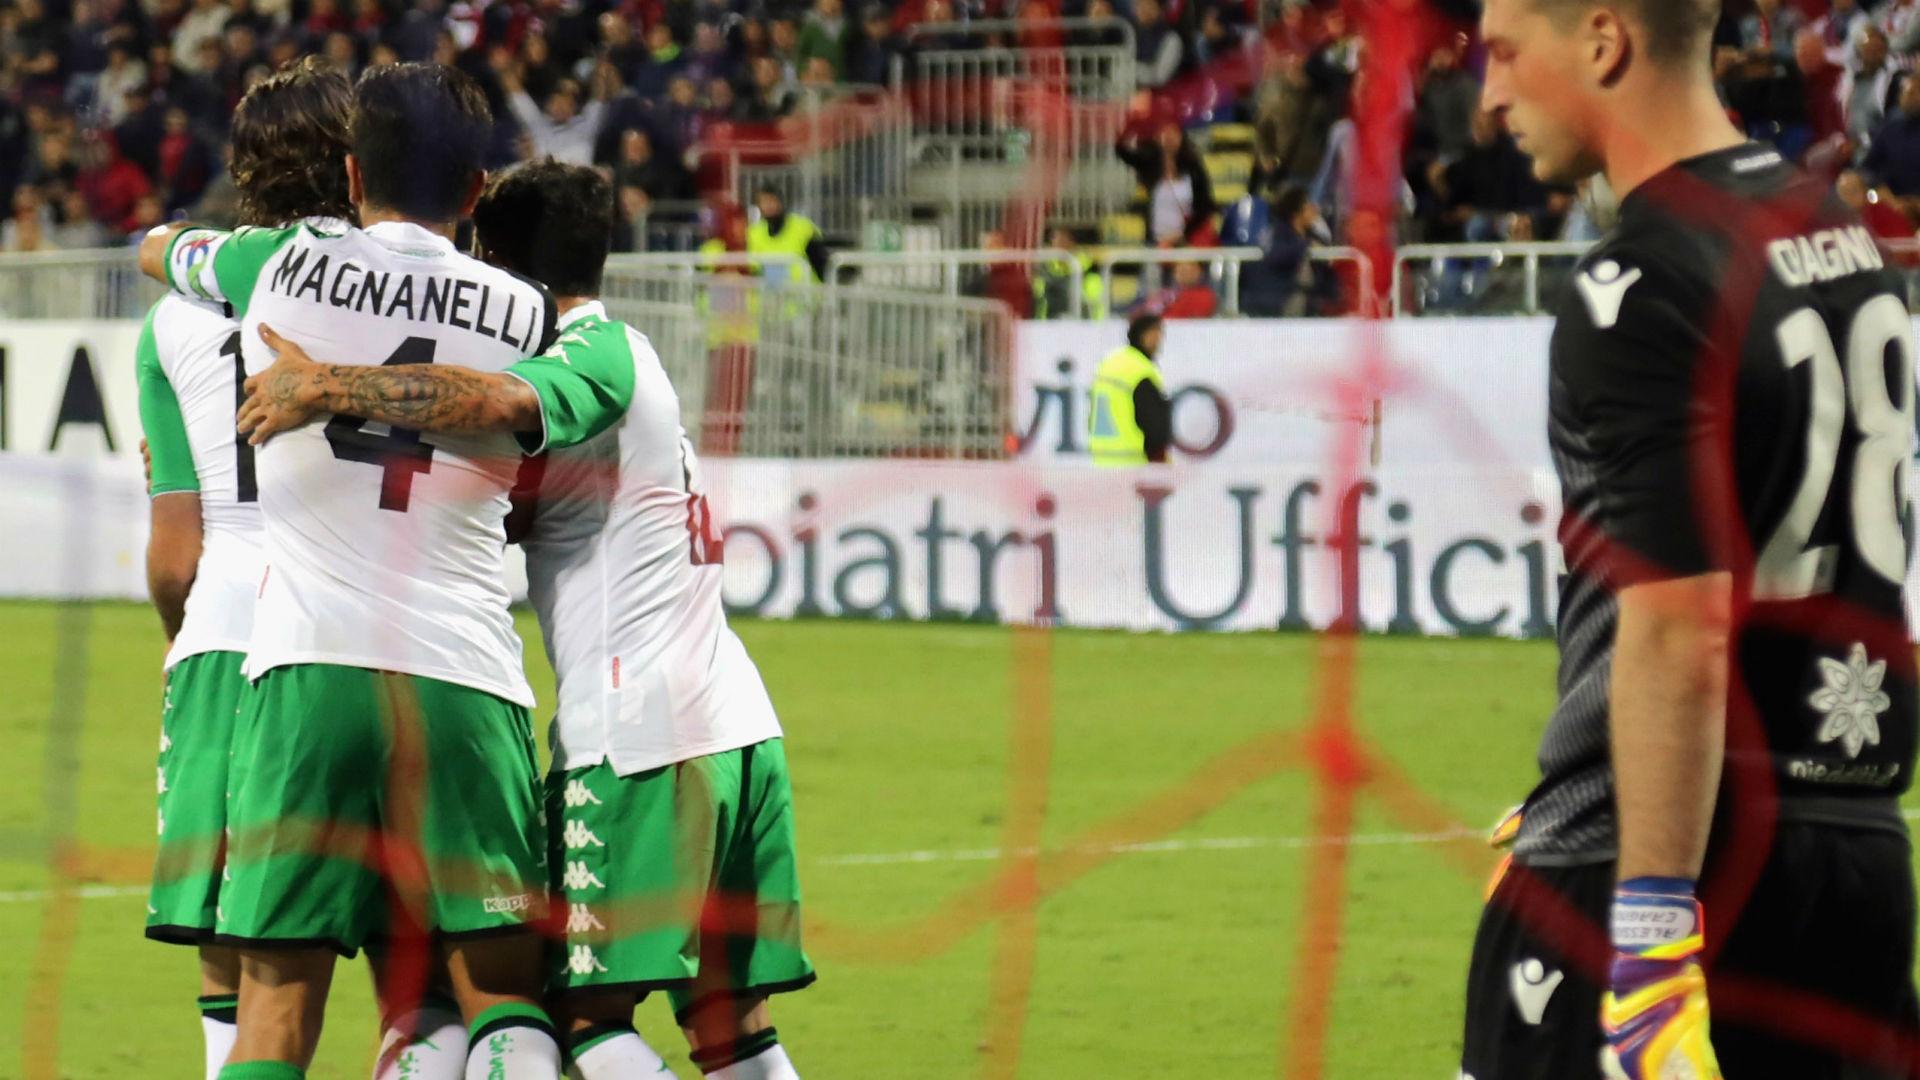 Tegola per il Napoli: Mertens esce infortunato